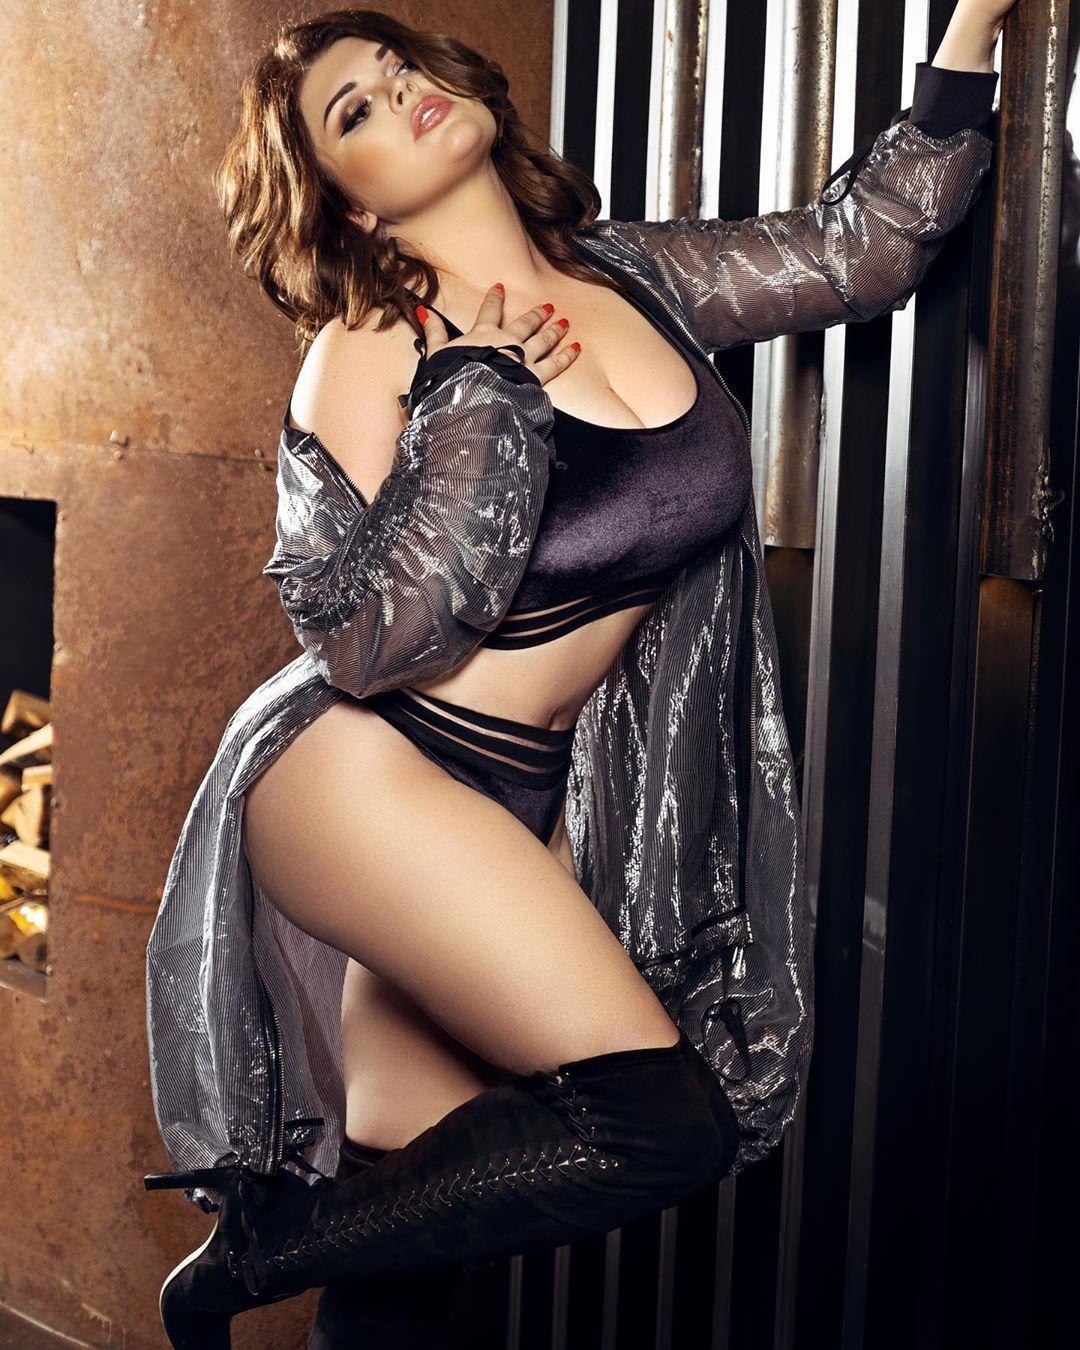 Юлия Рыбакова фото в белье